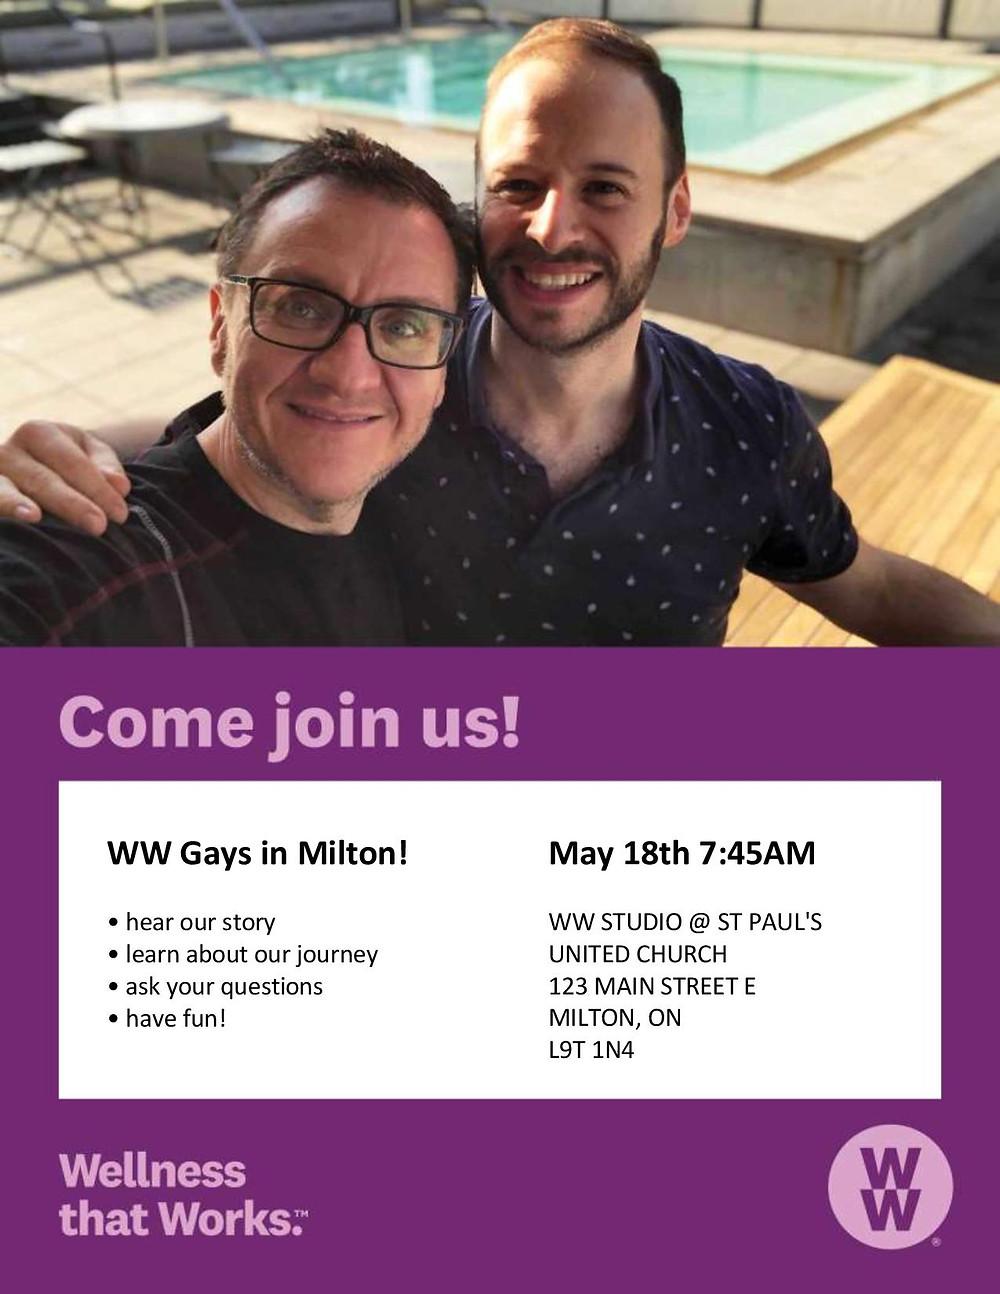 WW Gays in Milton!